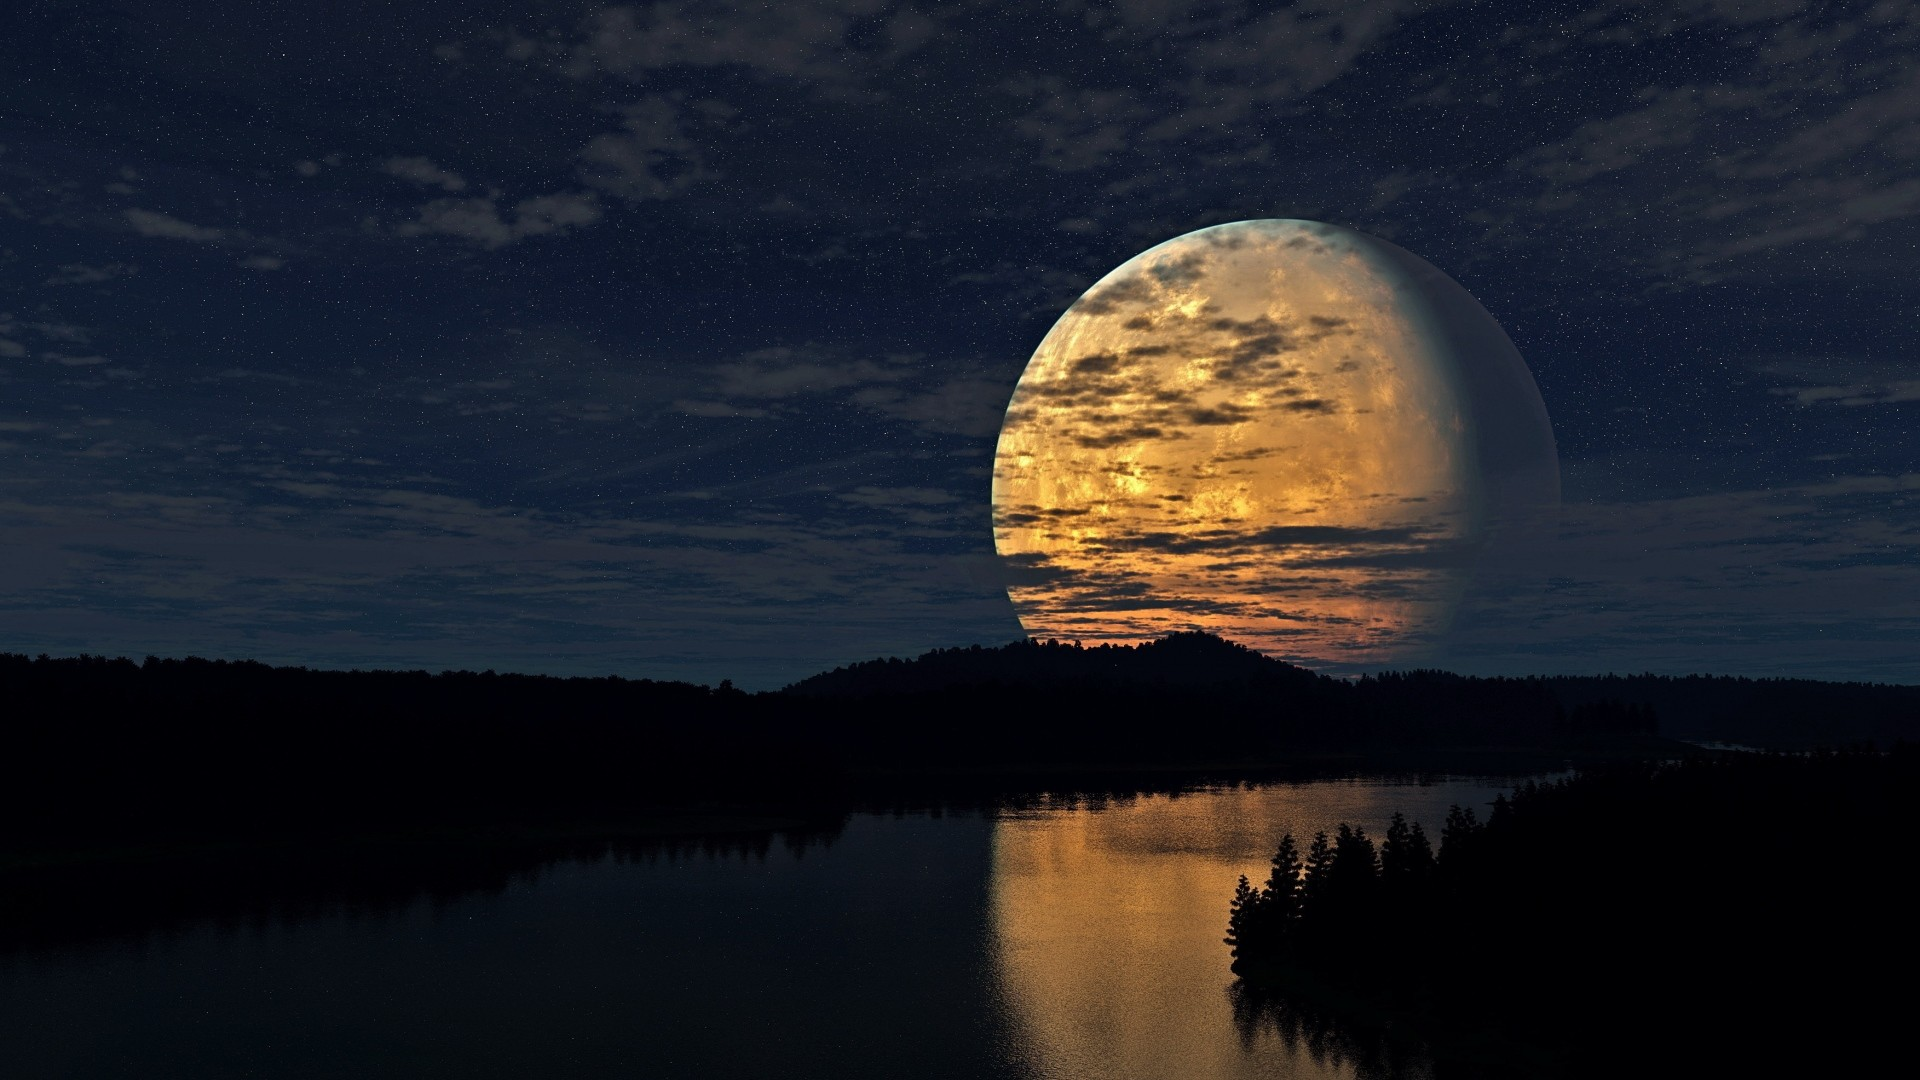 Wallpaper night, sky, moon, trees, river, reflection